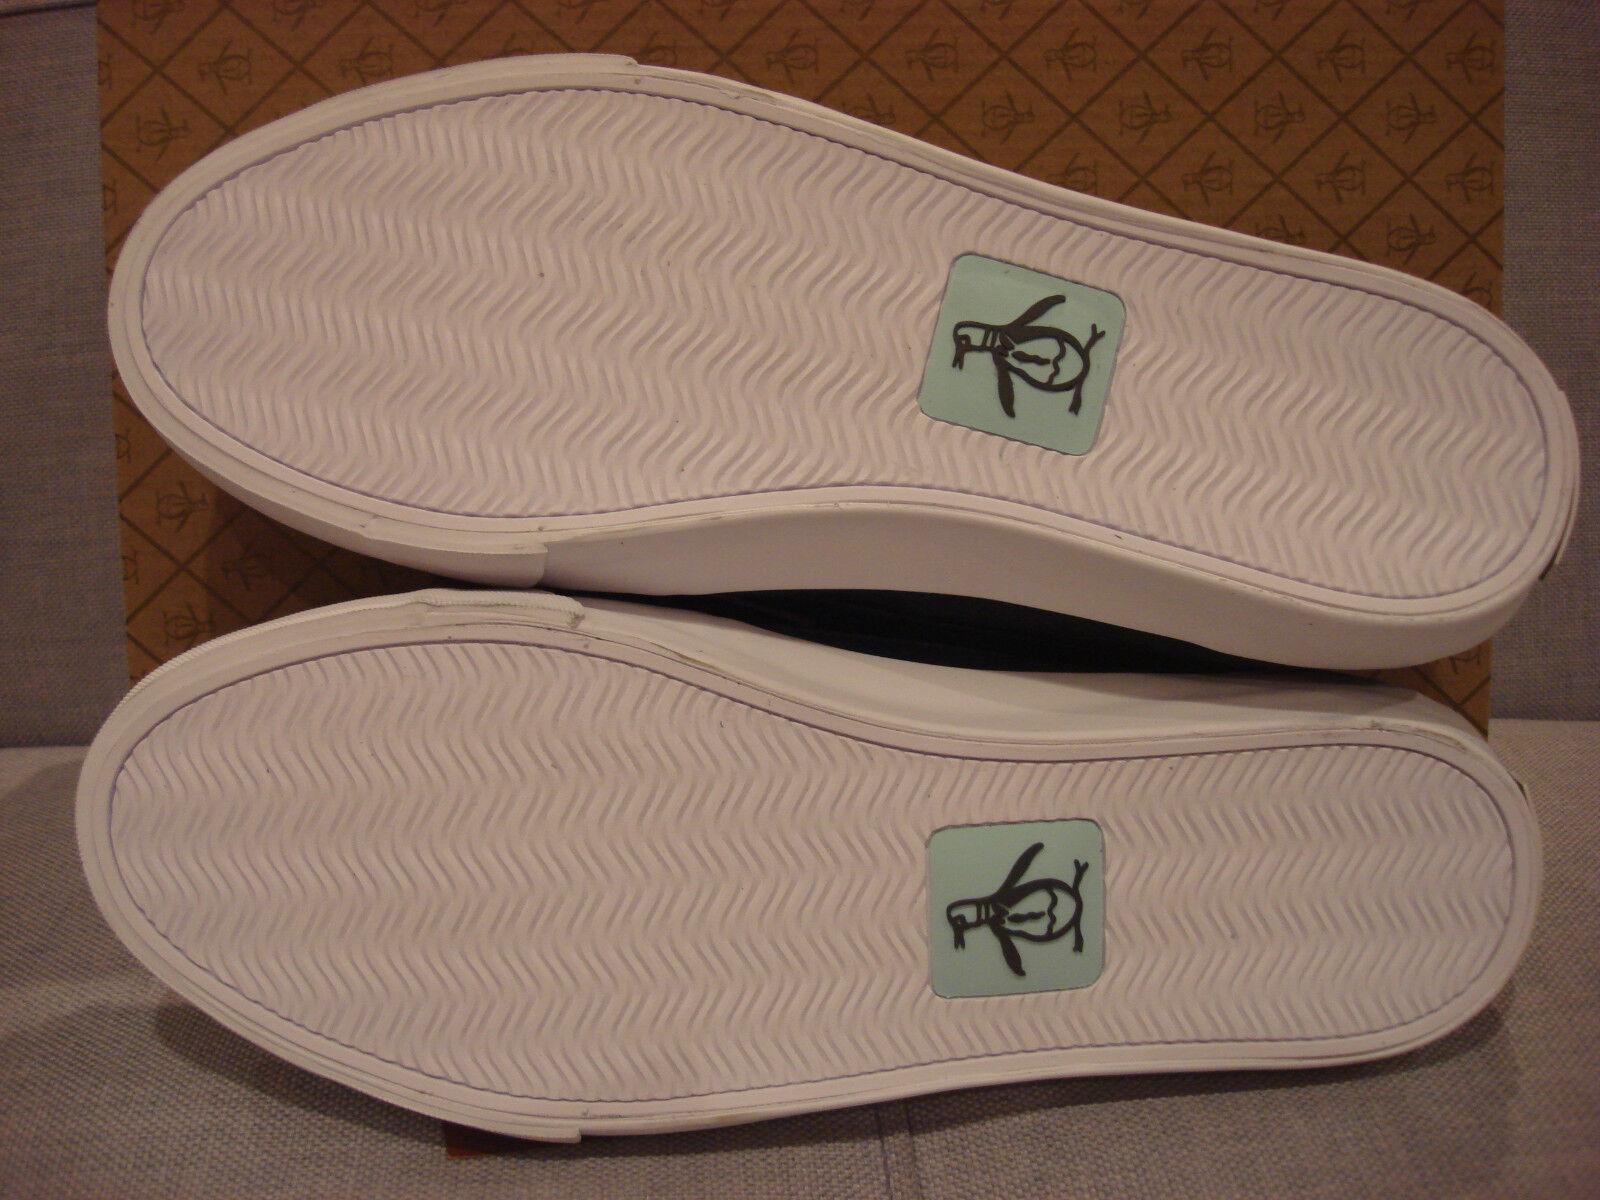 ORIGINAL PENGUIN MEN'S V SIZE PENNY SUEDE CASTLE ROCK SIZE V 8.5 Schuhe - BRAND NEW 96da70